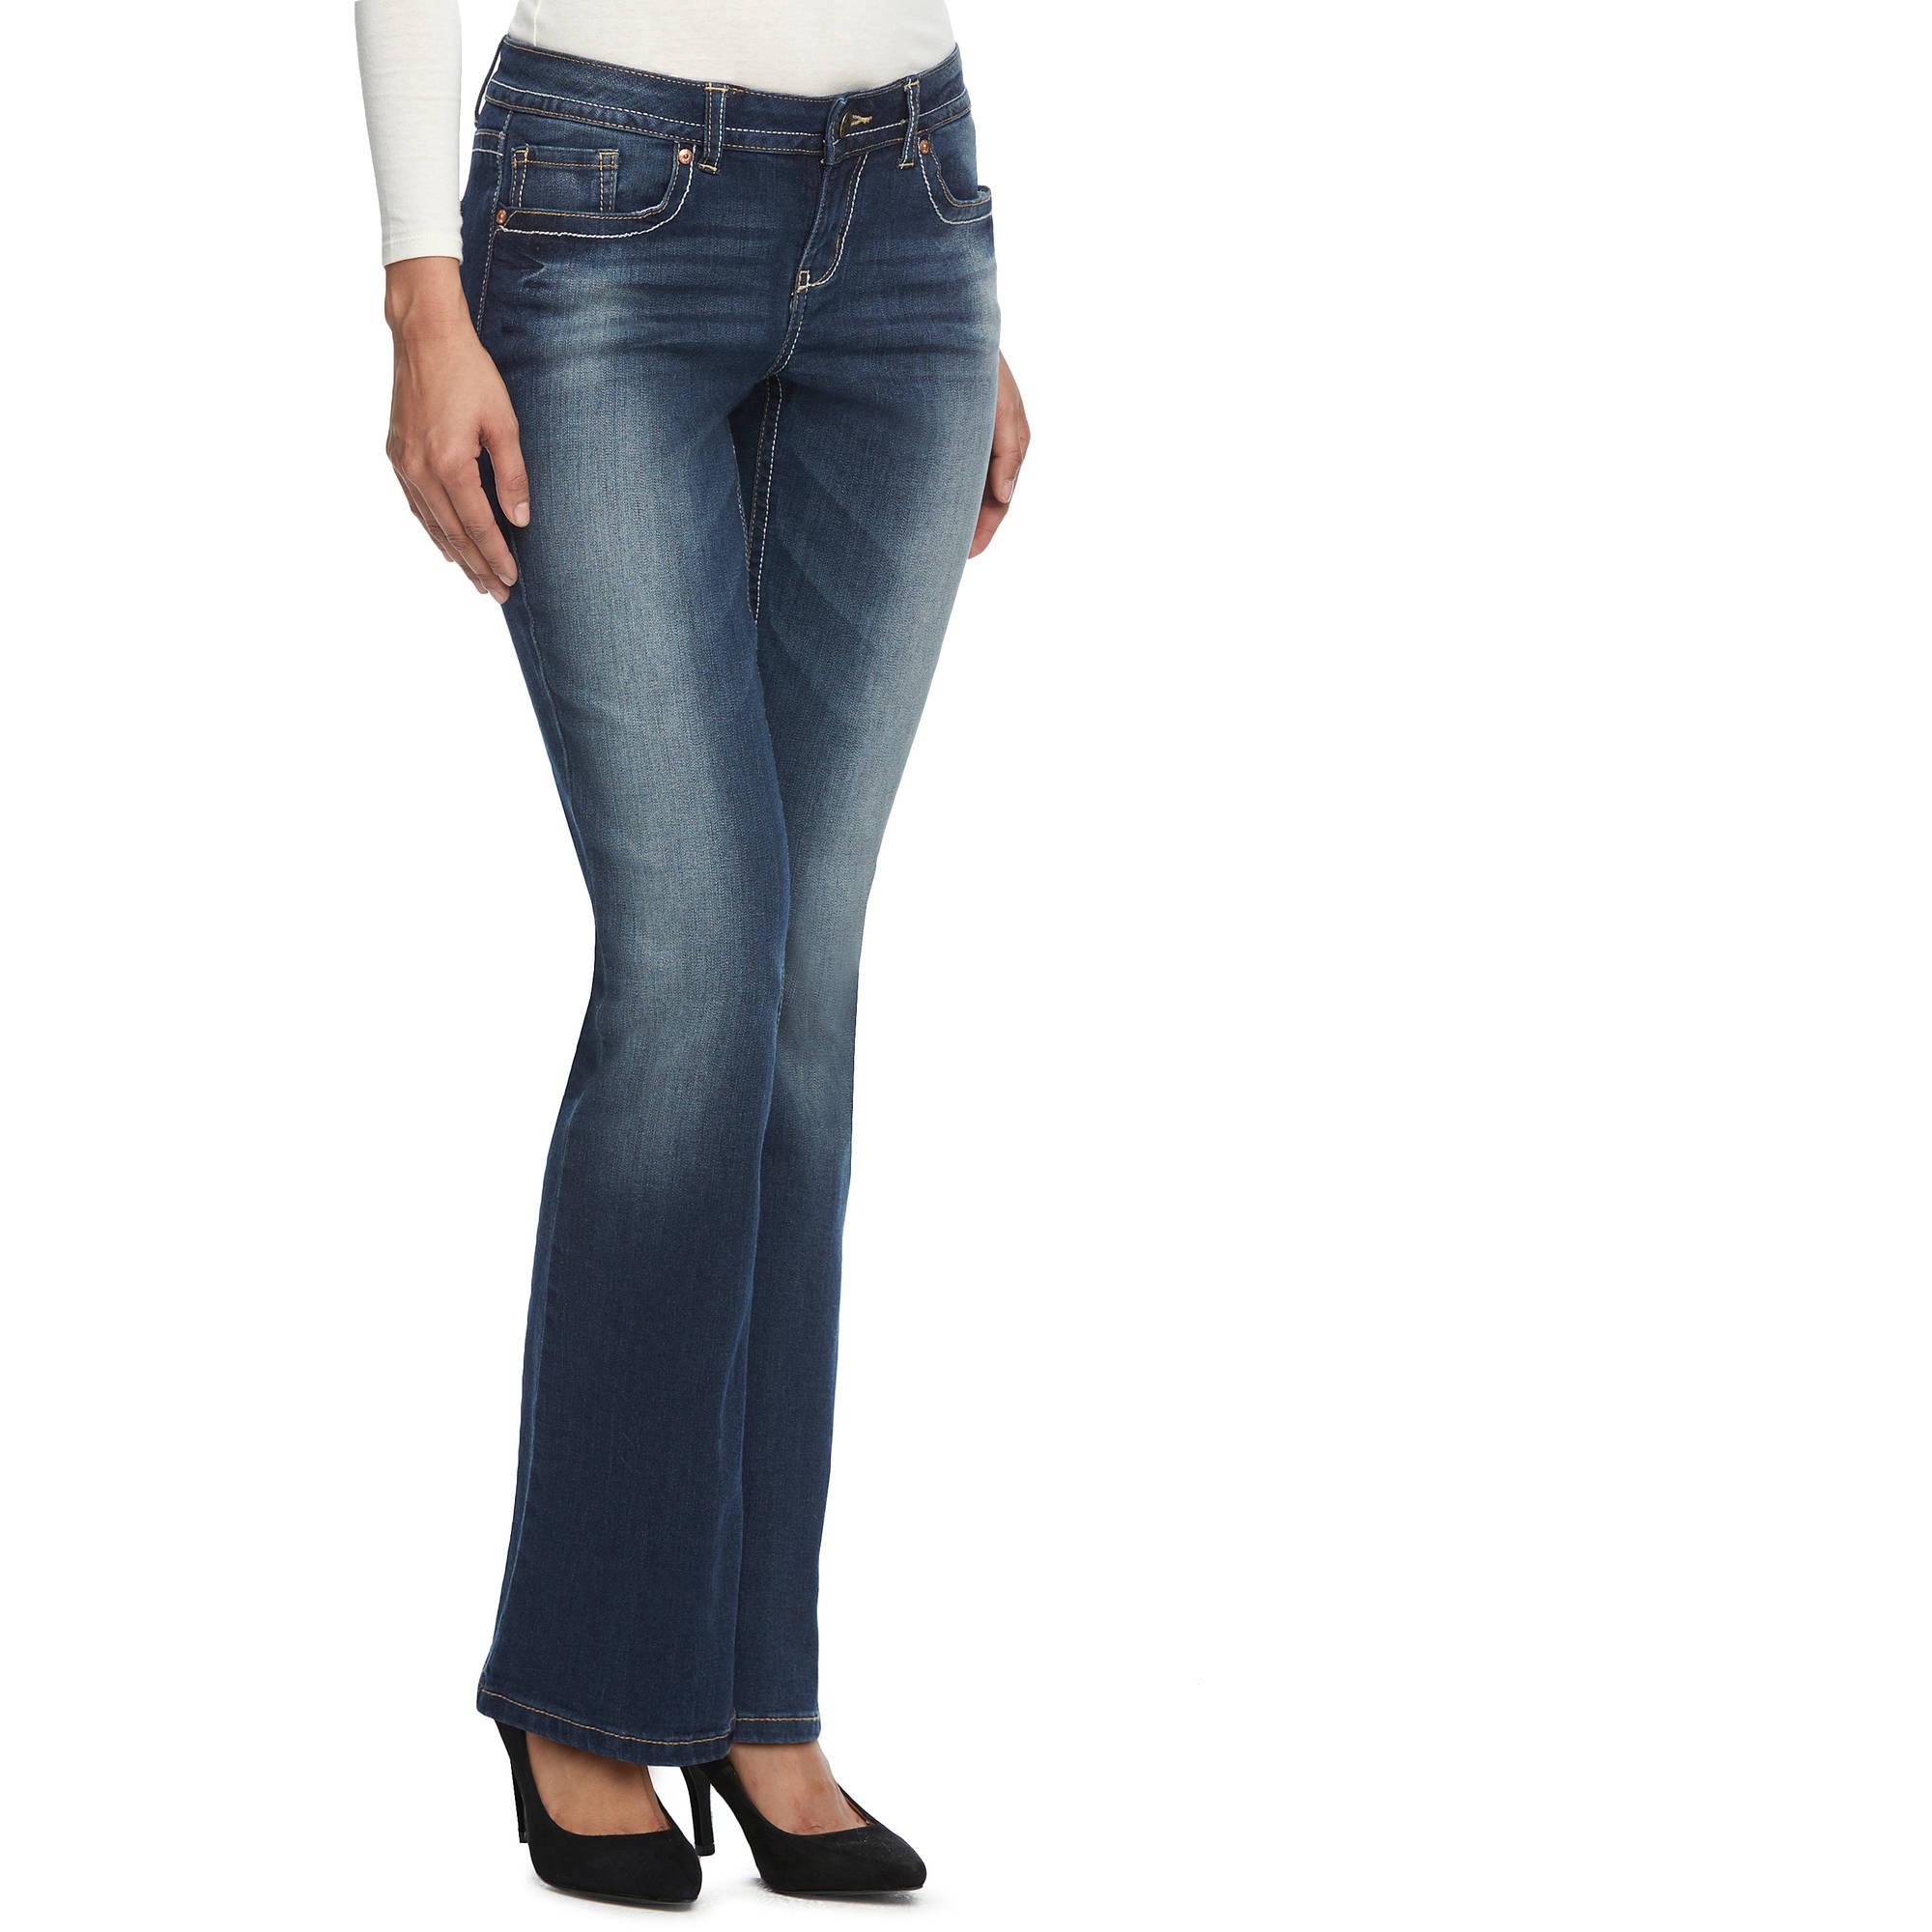 L.E.I. Juniors' Bridget Rayon Blend Curvy Bootcut Jeans